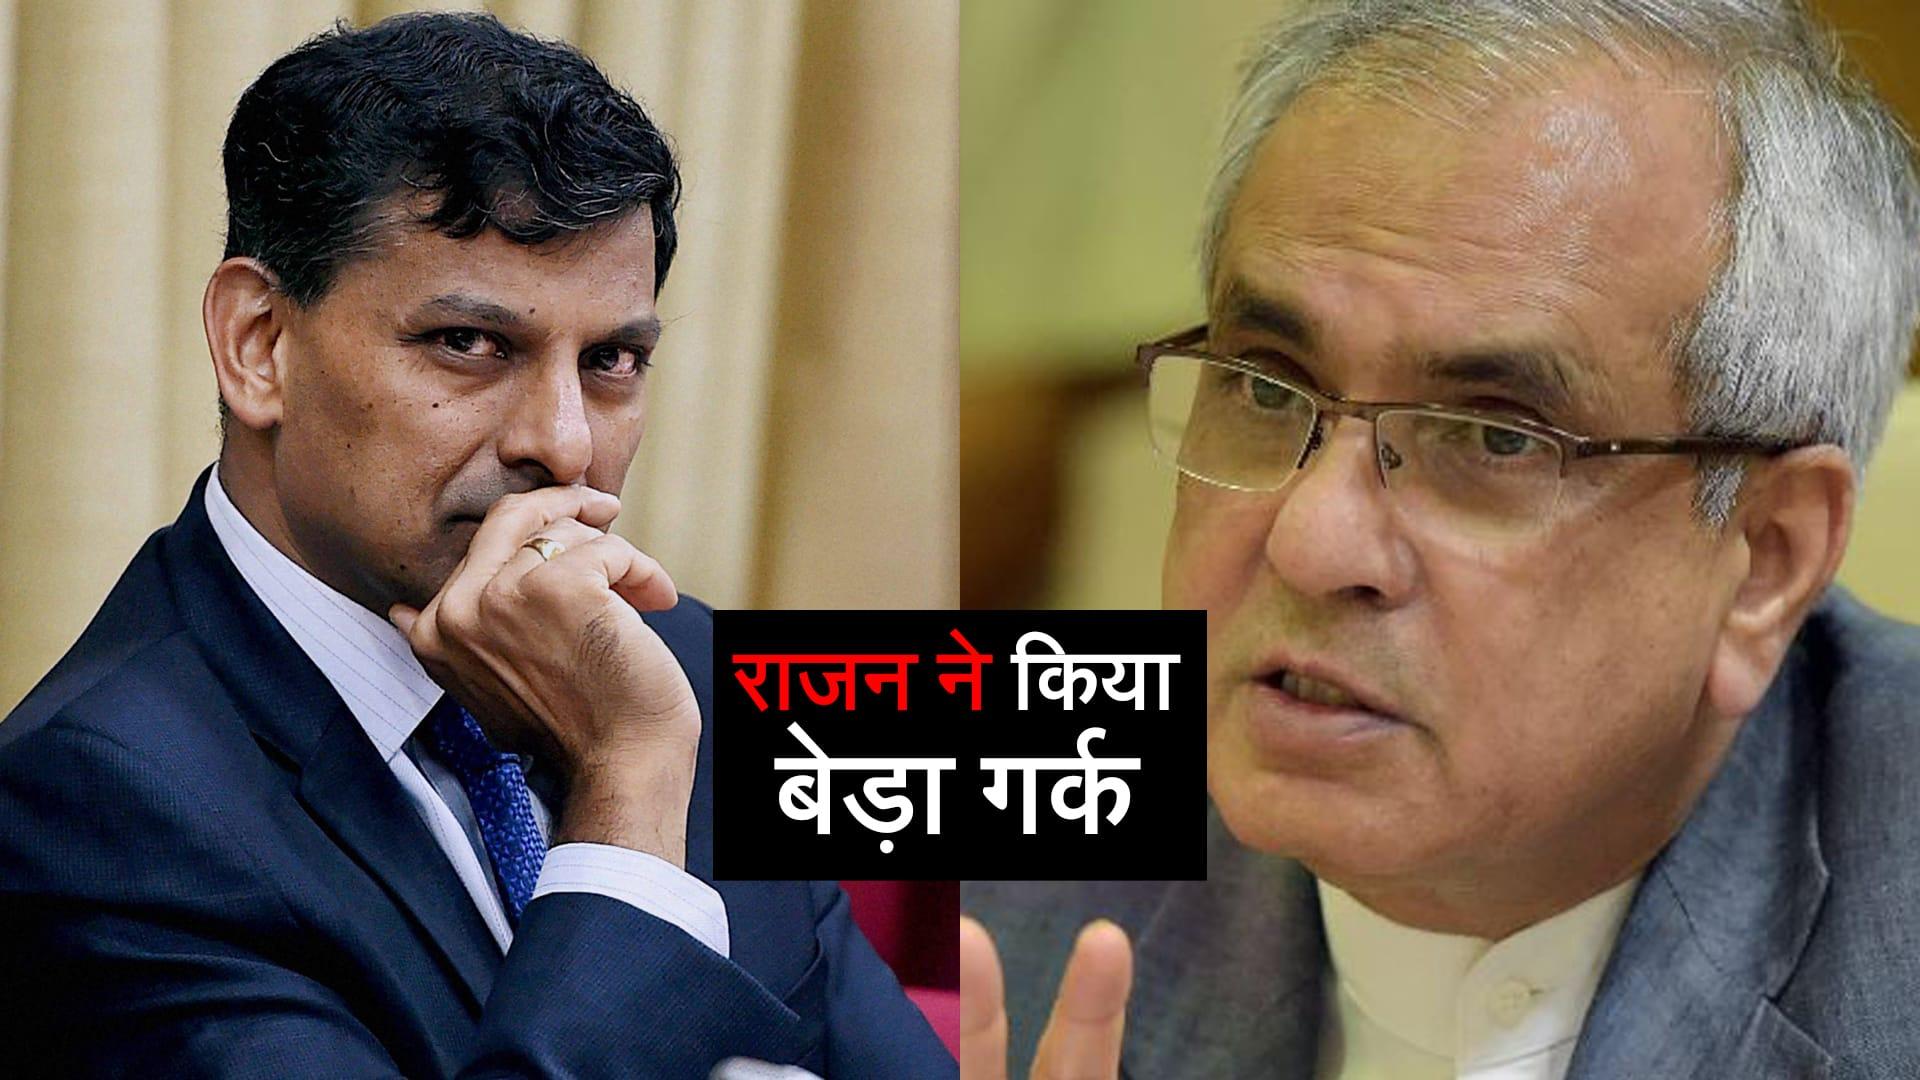 Raghuram rajan is main culprit